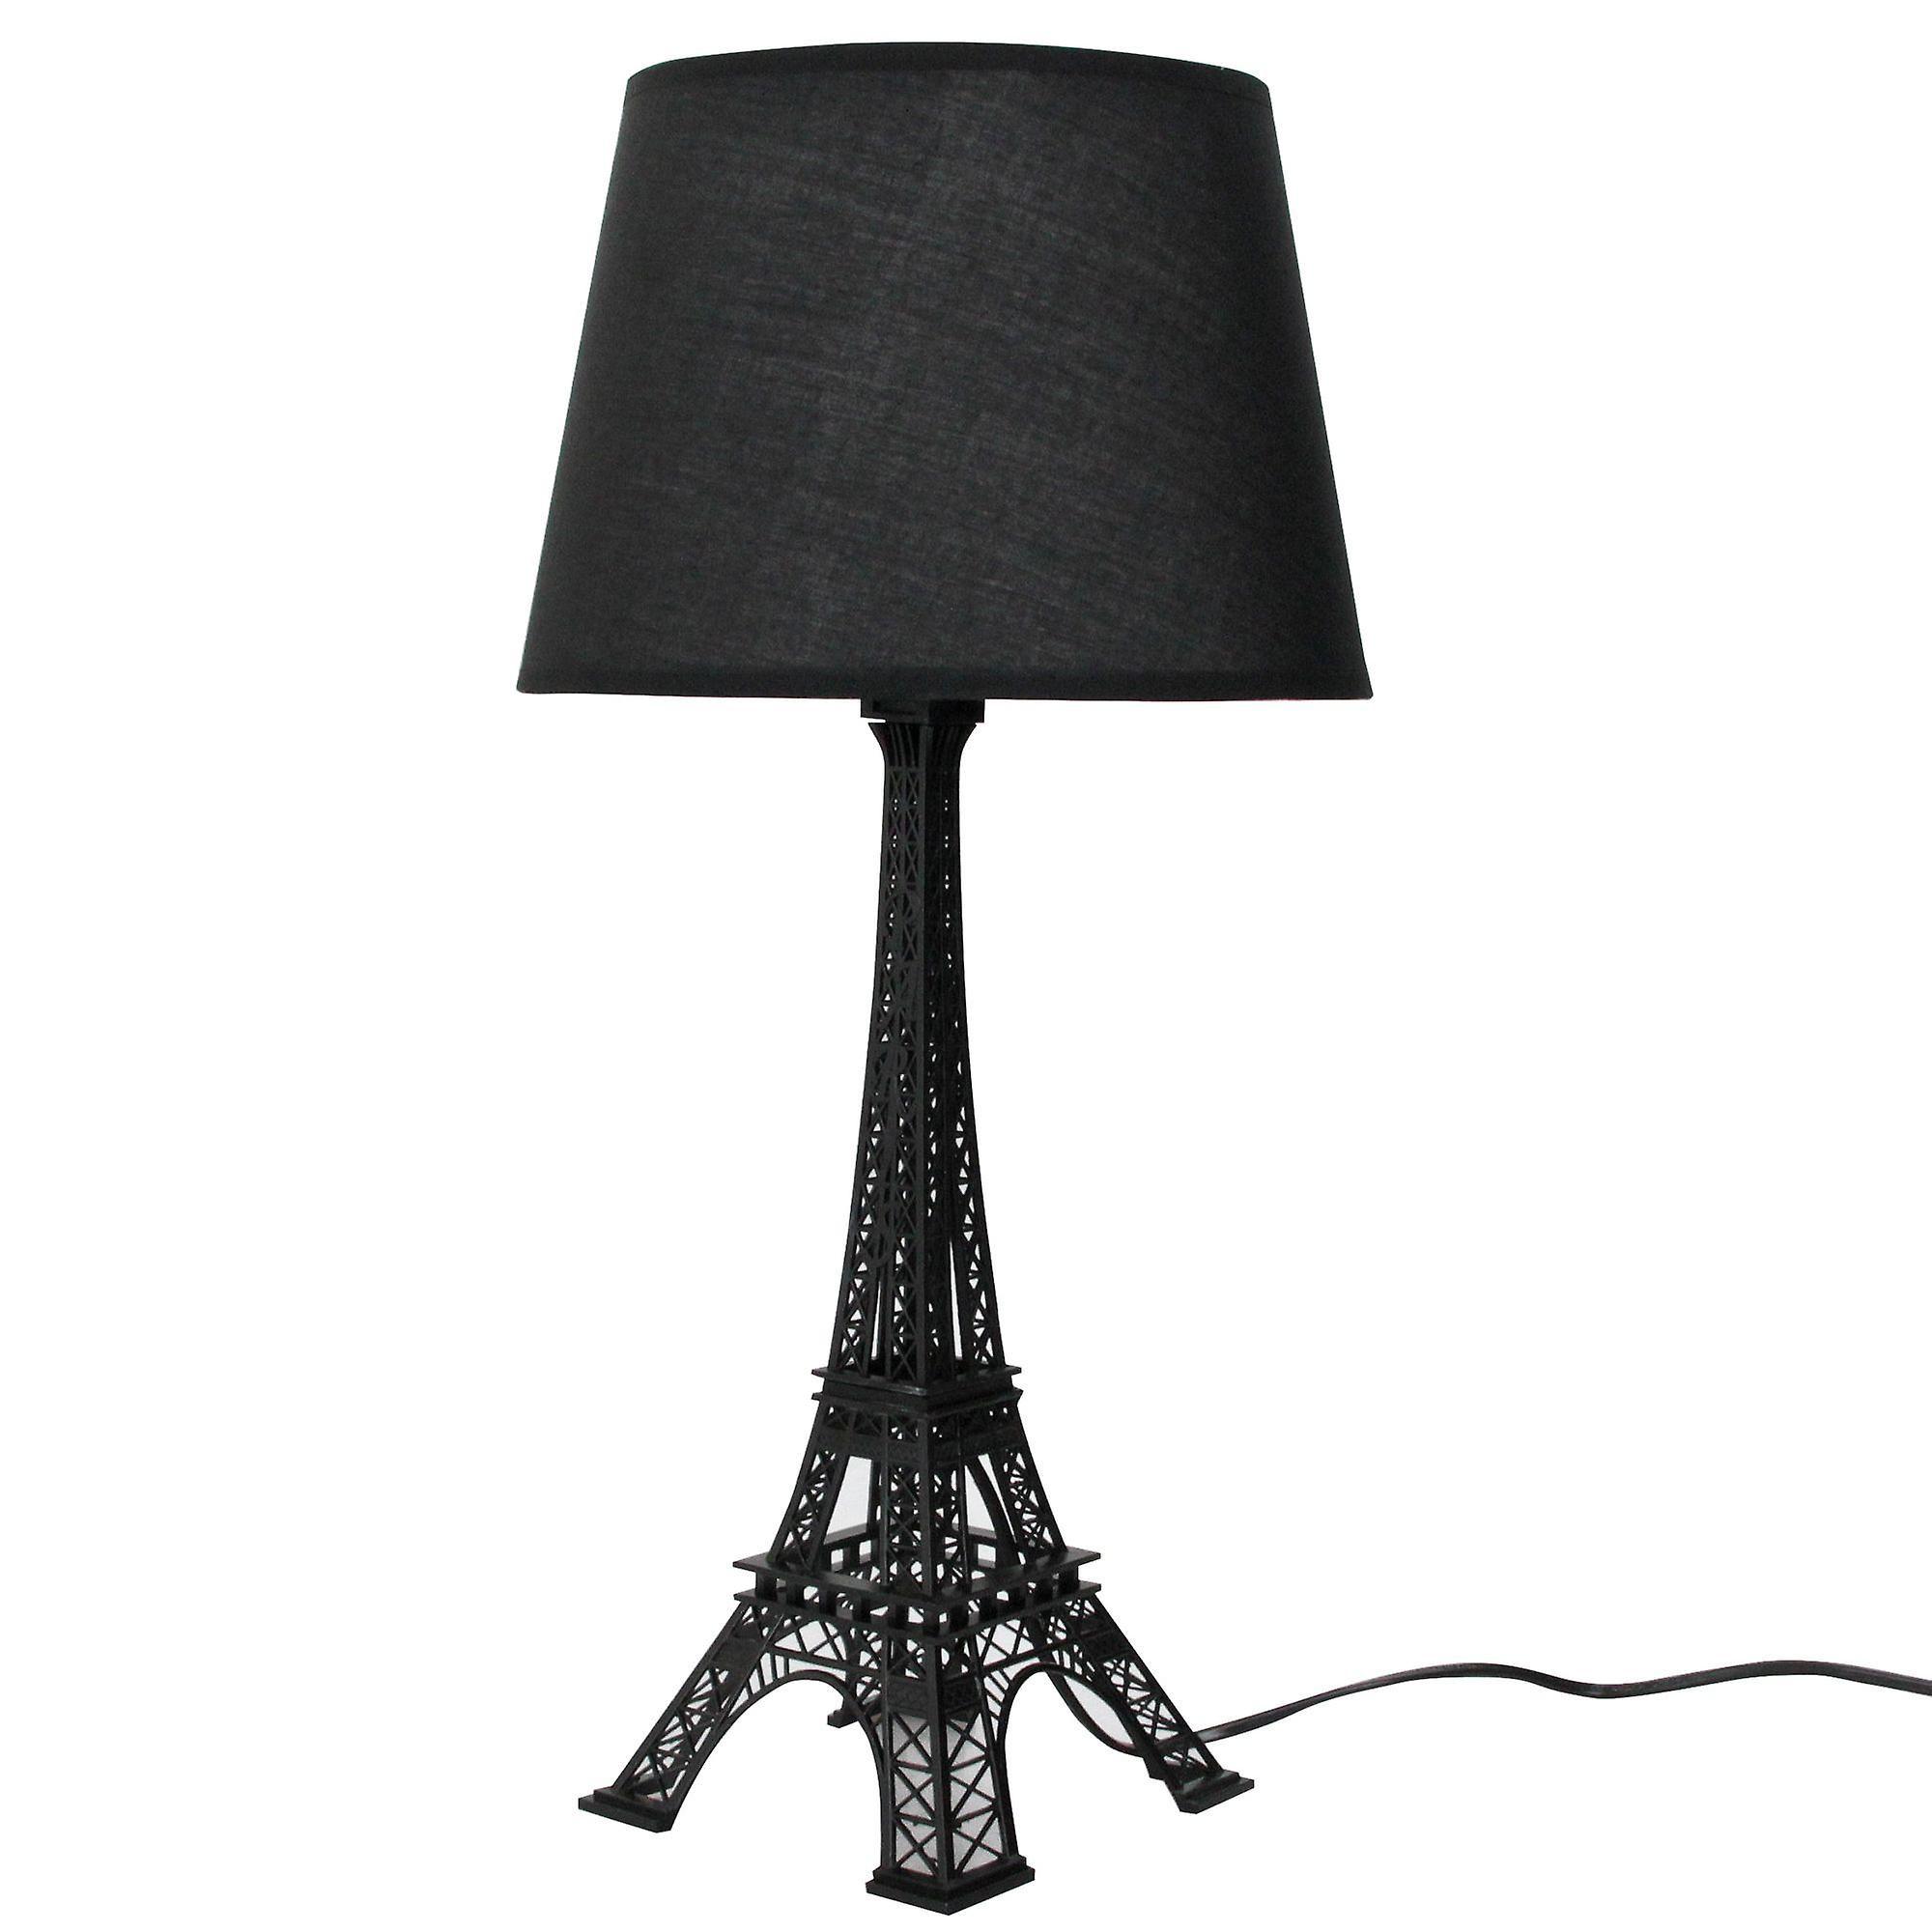 Decorative Black Desk Table Bedside Lamp Eiffel Tower Design H 52cm 20 5 Inch Lamps Bedroom Gift Luxury Lamps Tower Design